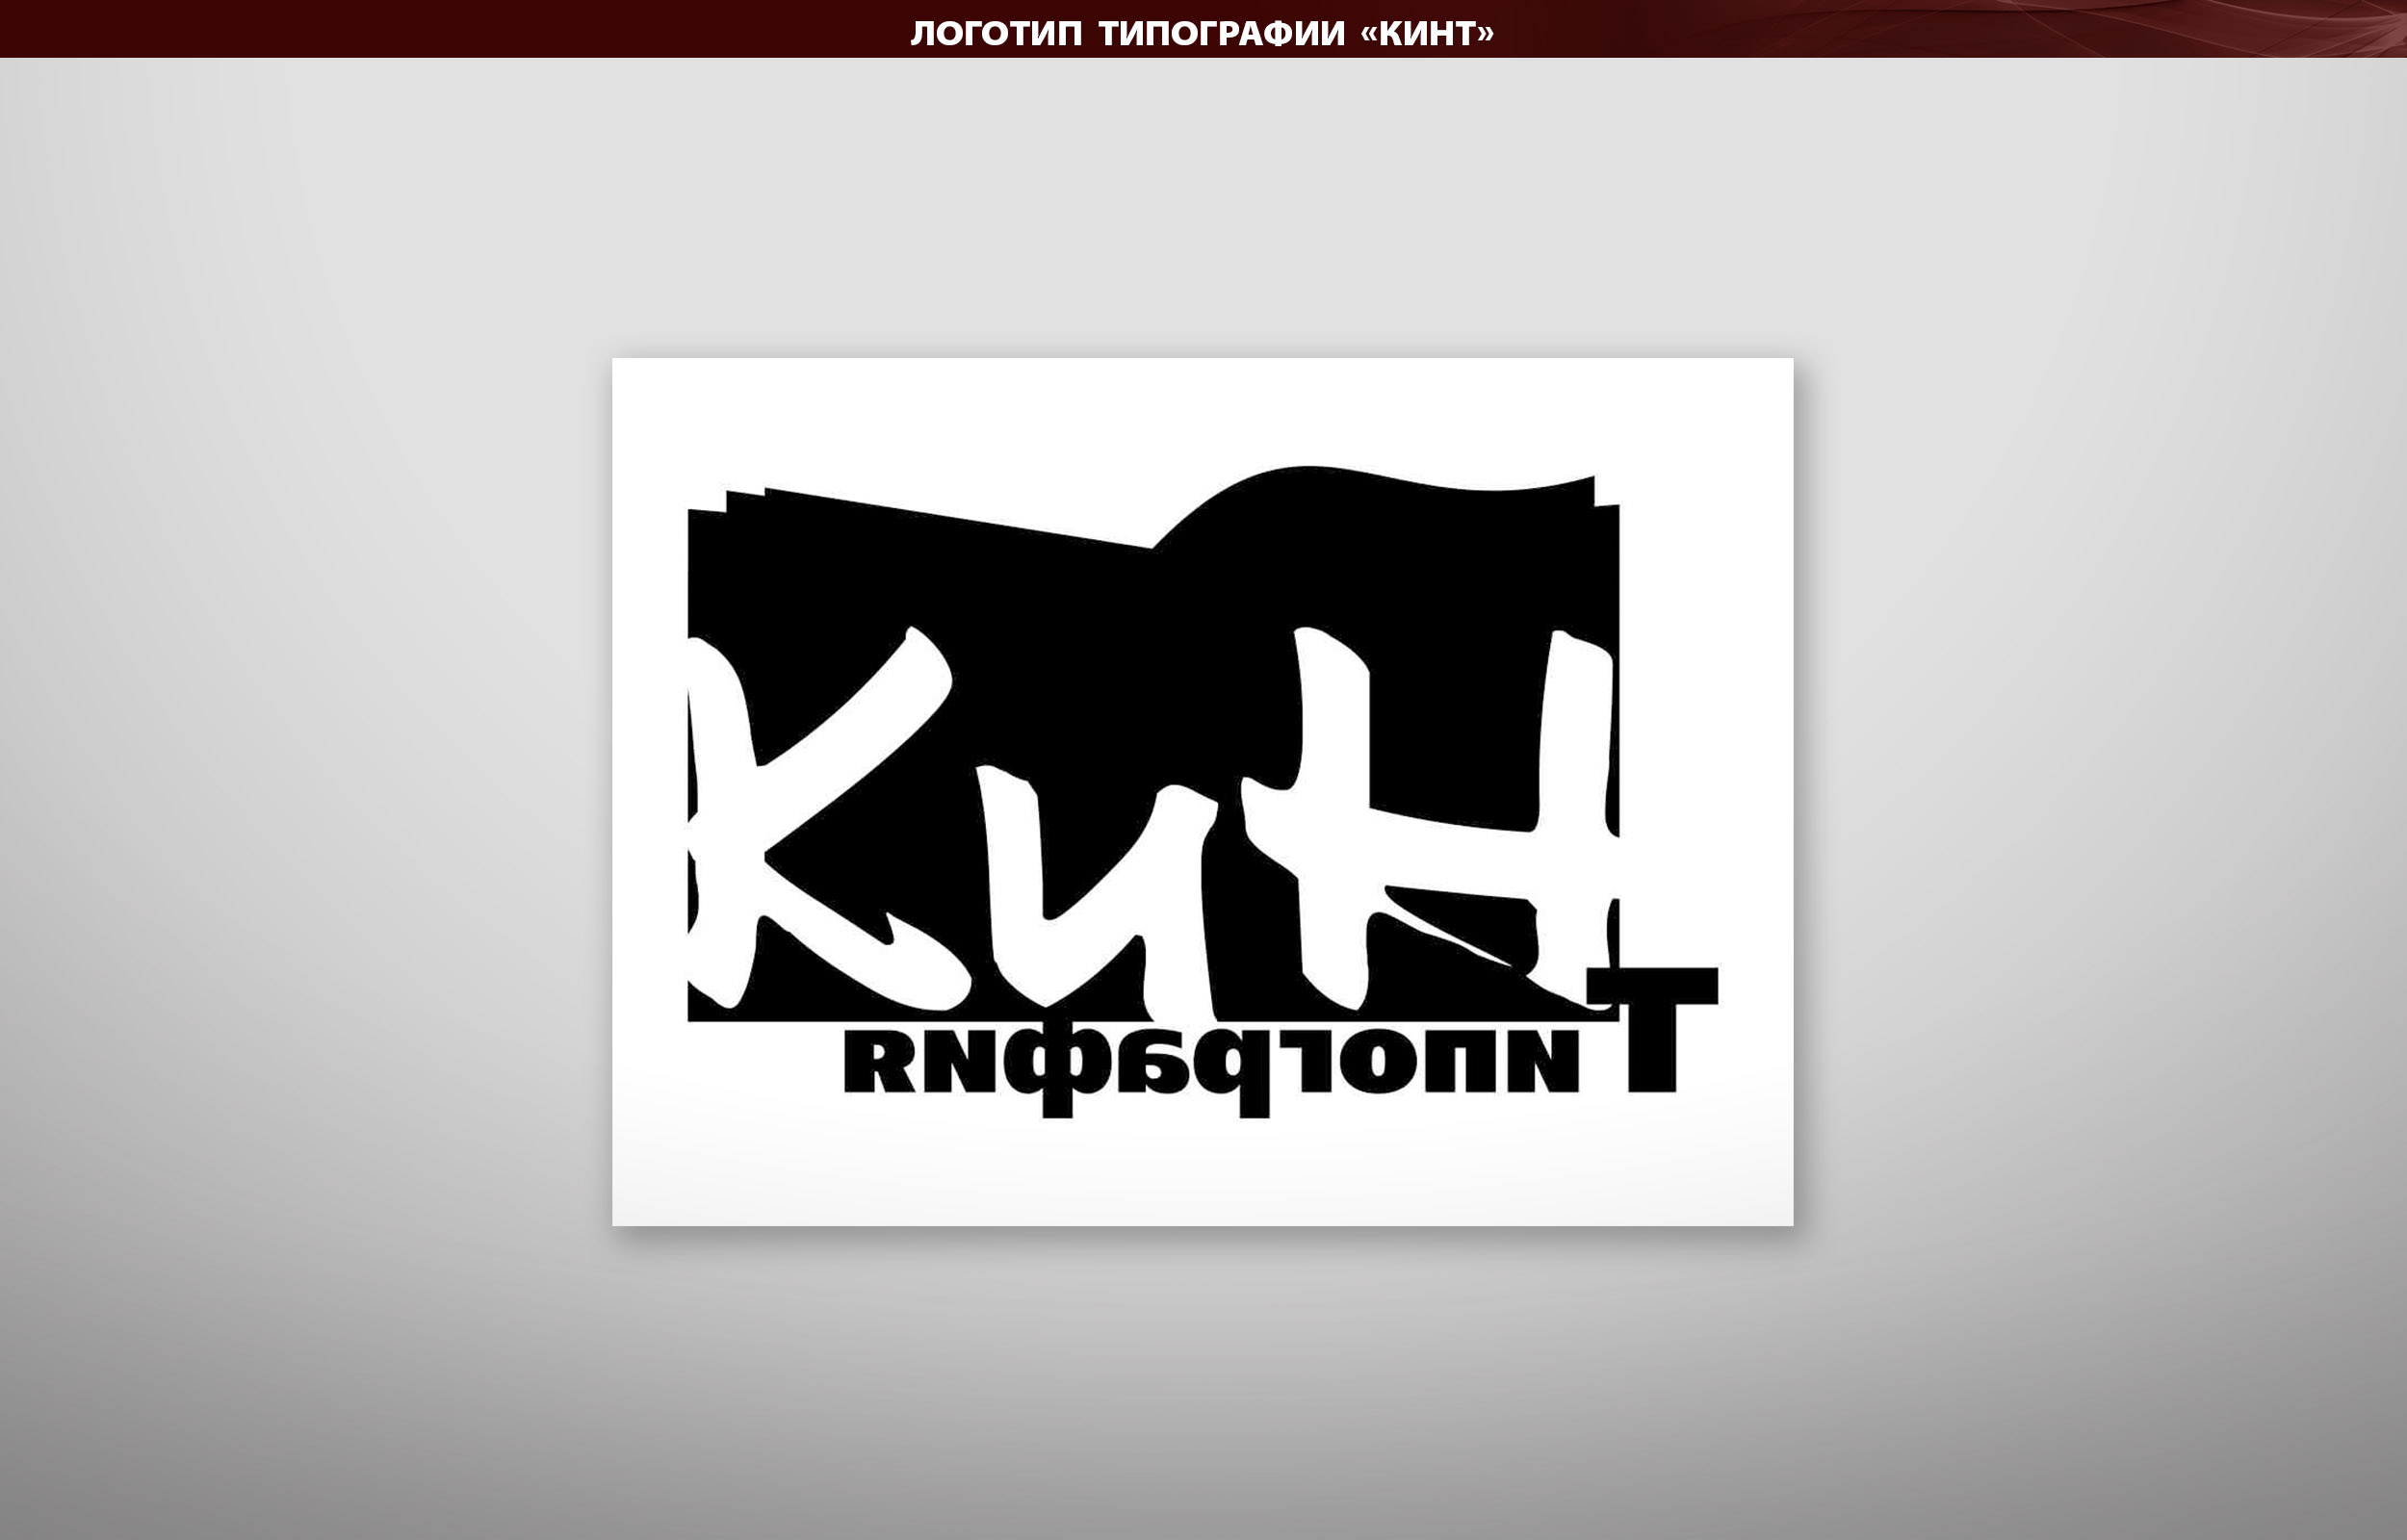 Логотип типографии «КиНт»